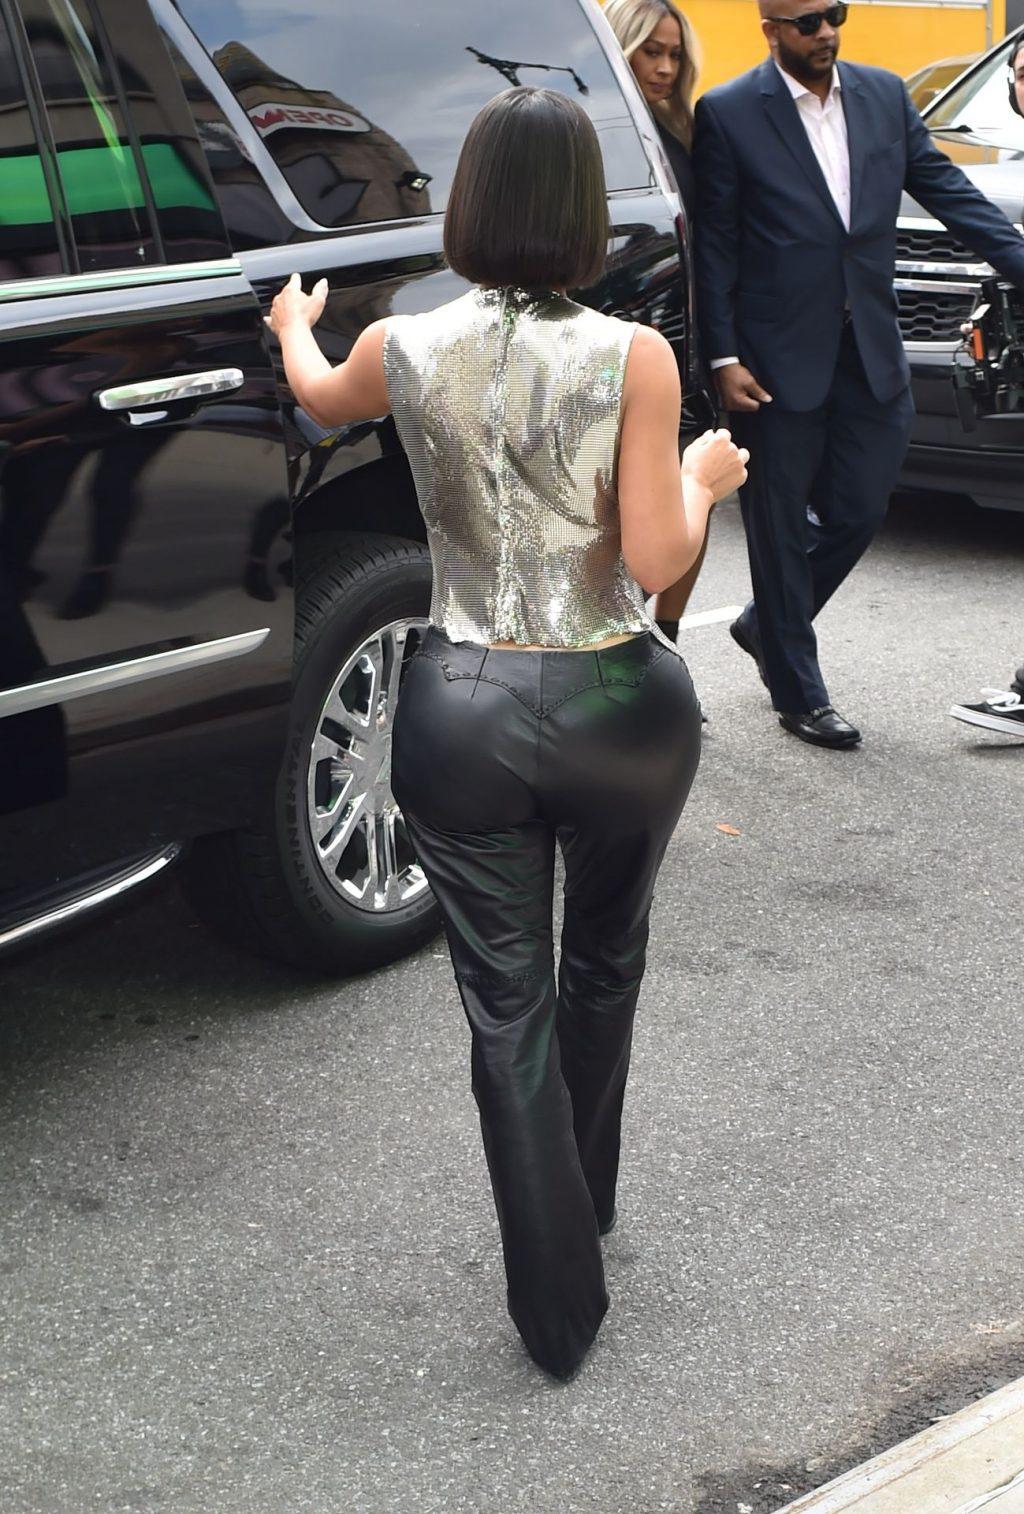 Uncategorized 2019 : Kim Kardashian arrives at a fashion show in New York during New York Fashion Week 2019-26